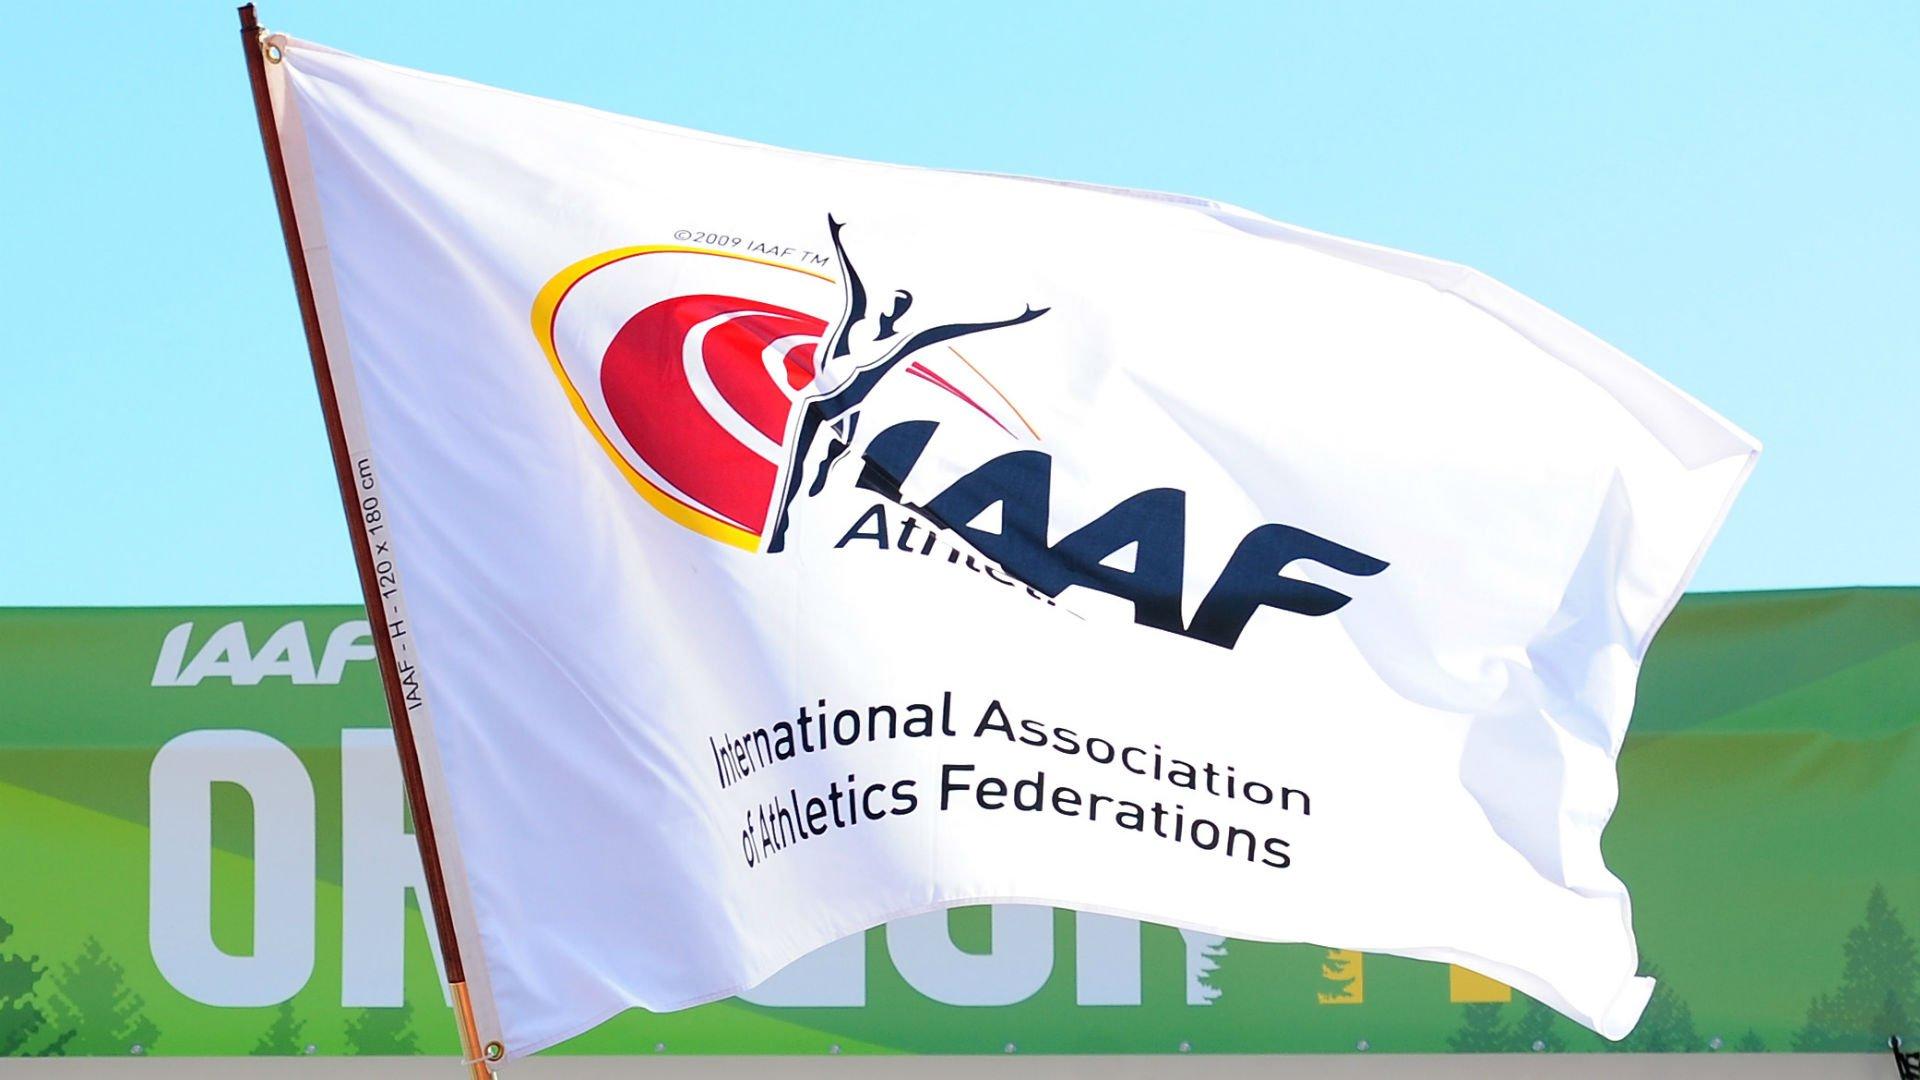 IAAF получила более 80 заявок от российских легкоатлетов на участие в Олимпиаде